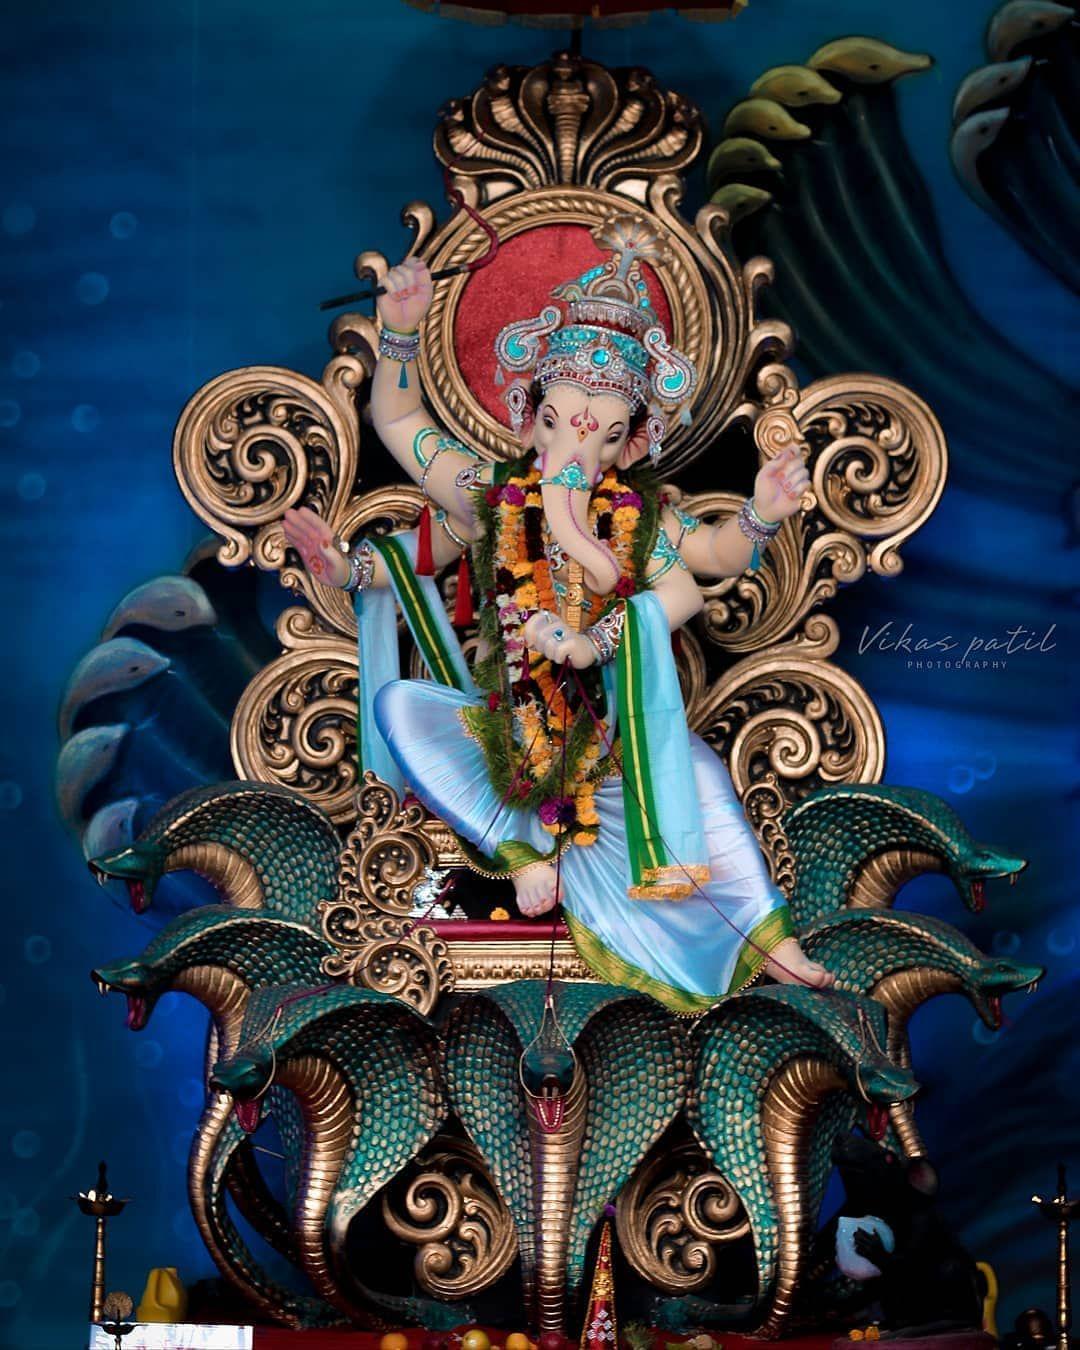 Mumbai Ganesha Charkop Cha Shree Vighnaharta 2019